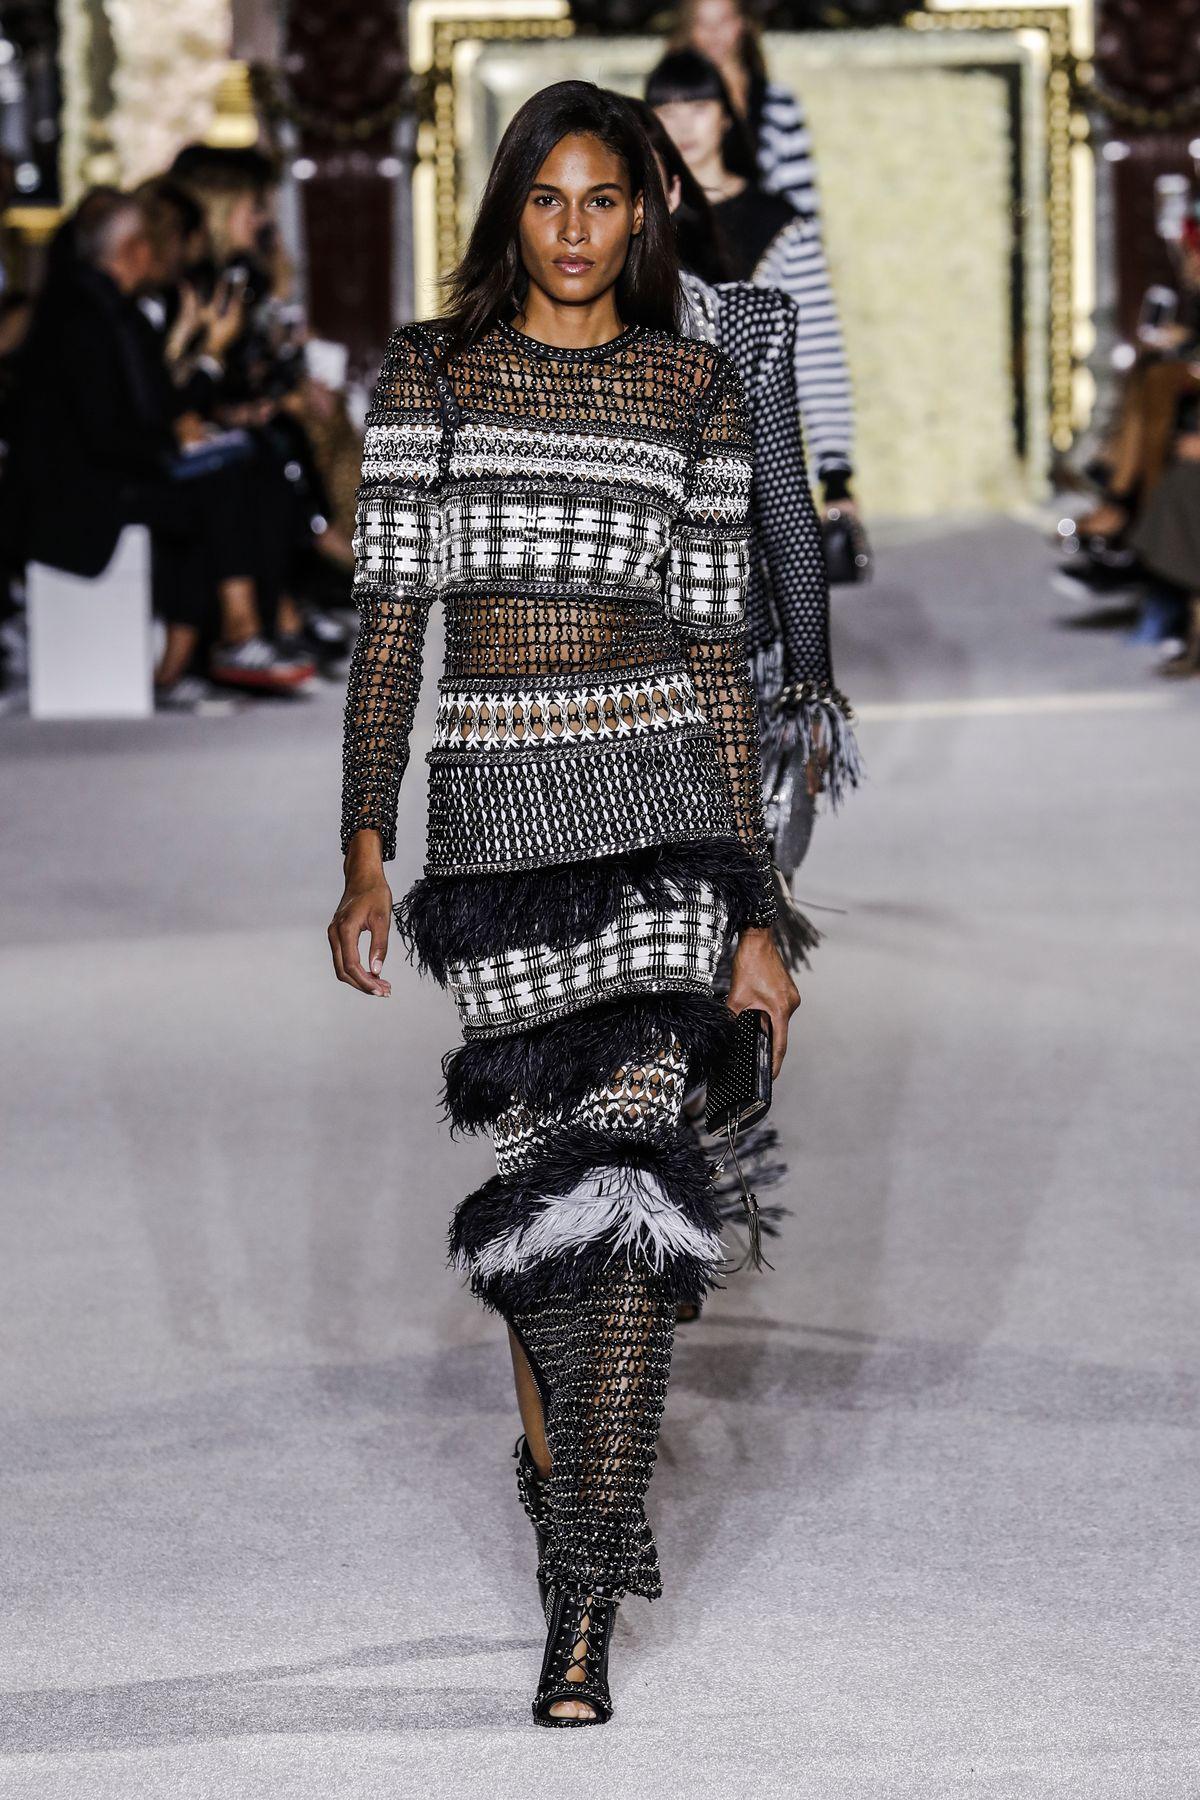 Fashion profi haute couture shots magazin - Chambre syndicale de la haute couture parisienne ...